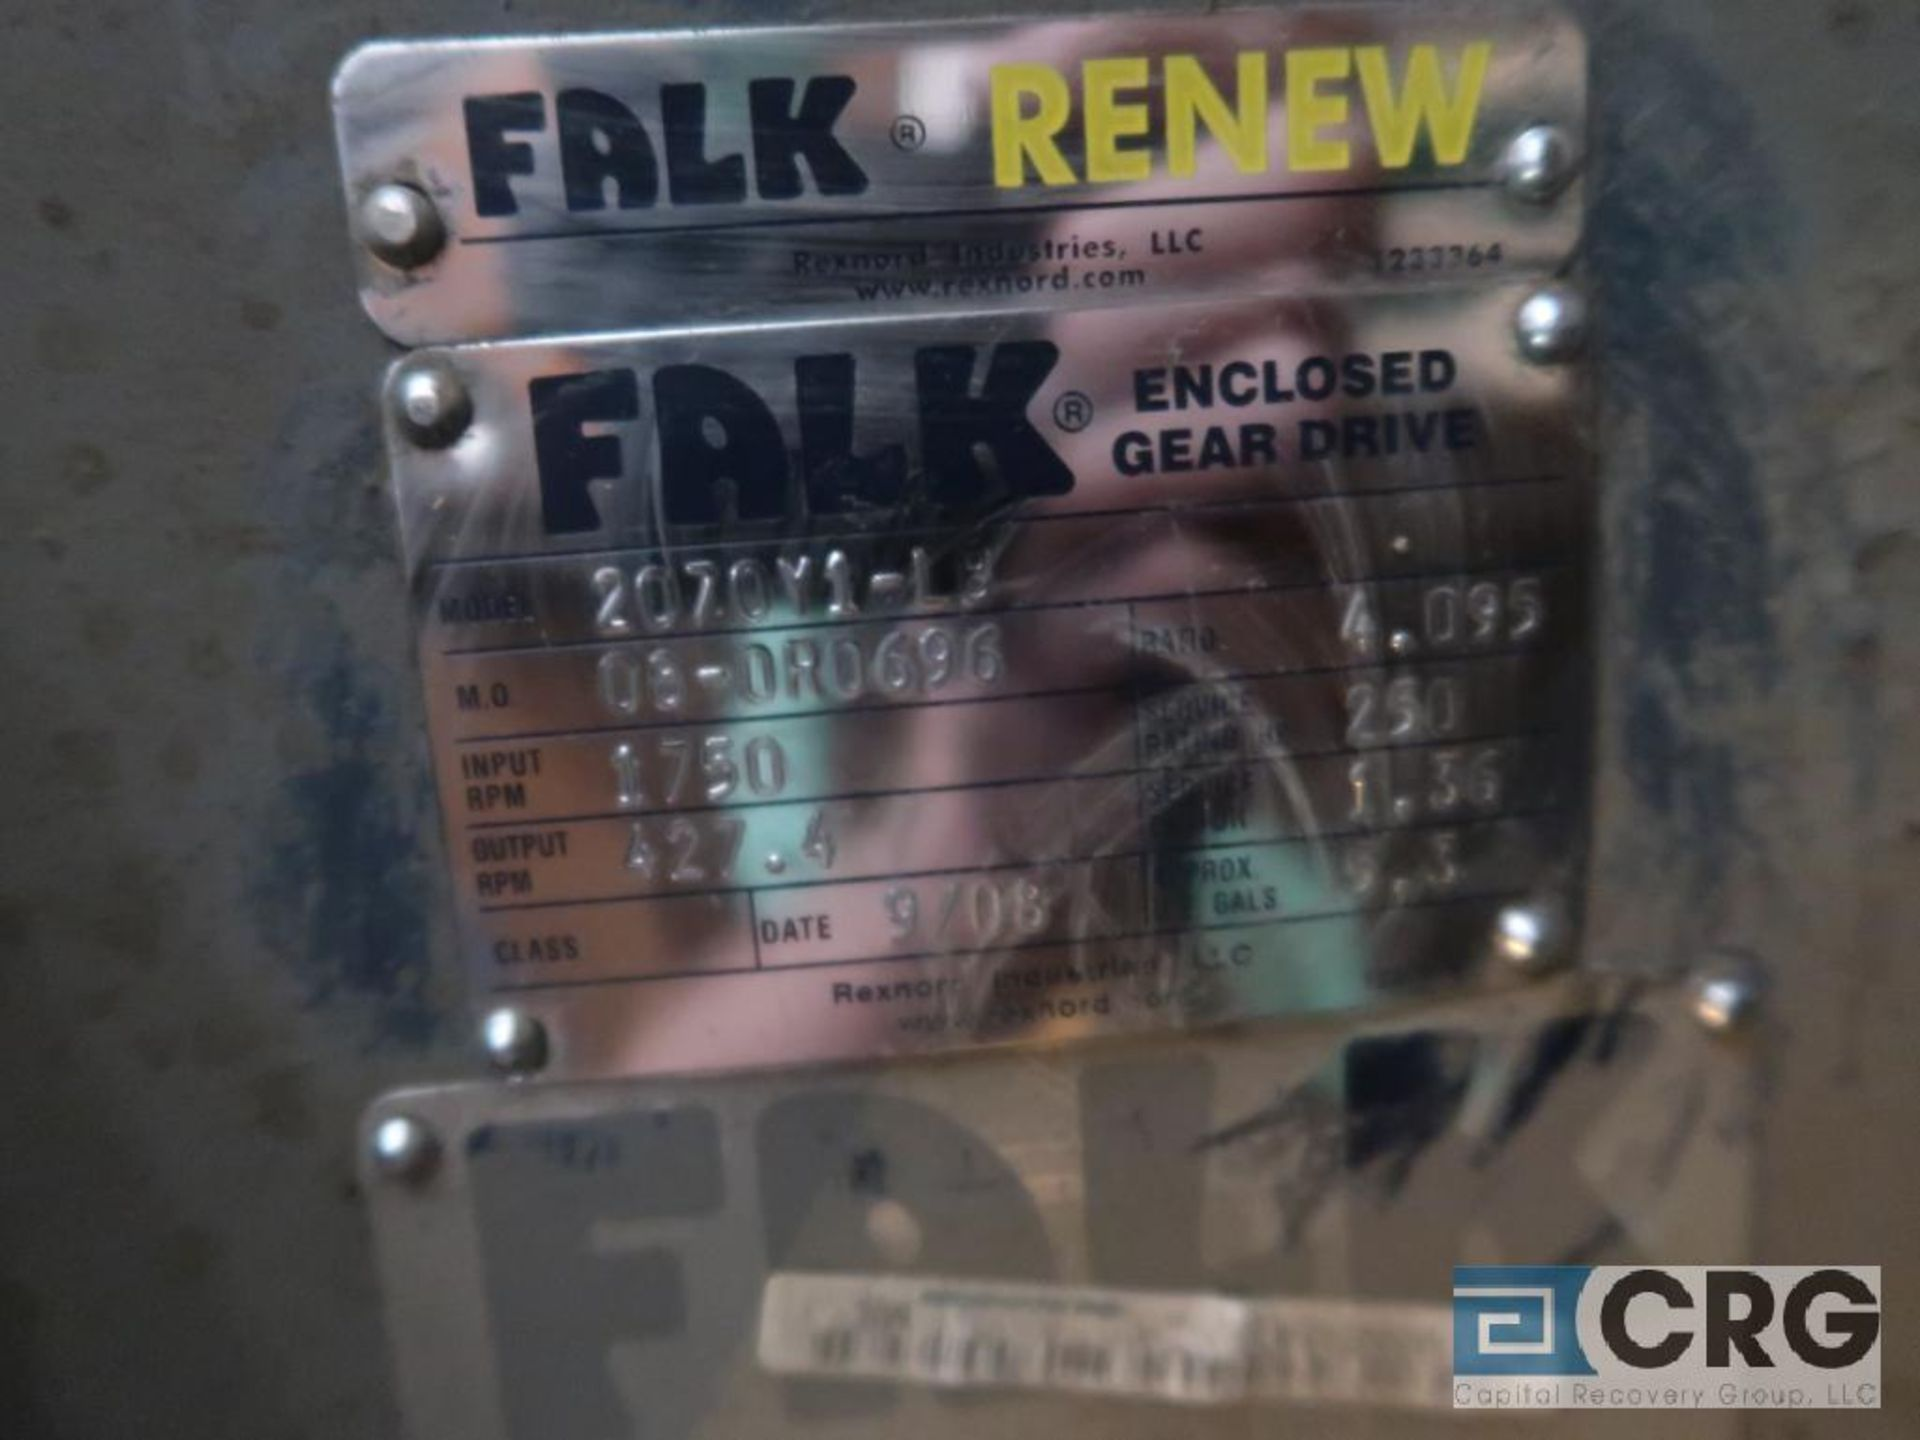 Falk 2070Y1LB gear drive, ratio-4.095, input RPM 1,750, output RPM 427.4, service rate HP. 250, s/ - Image 2 of 2